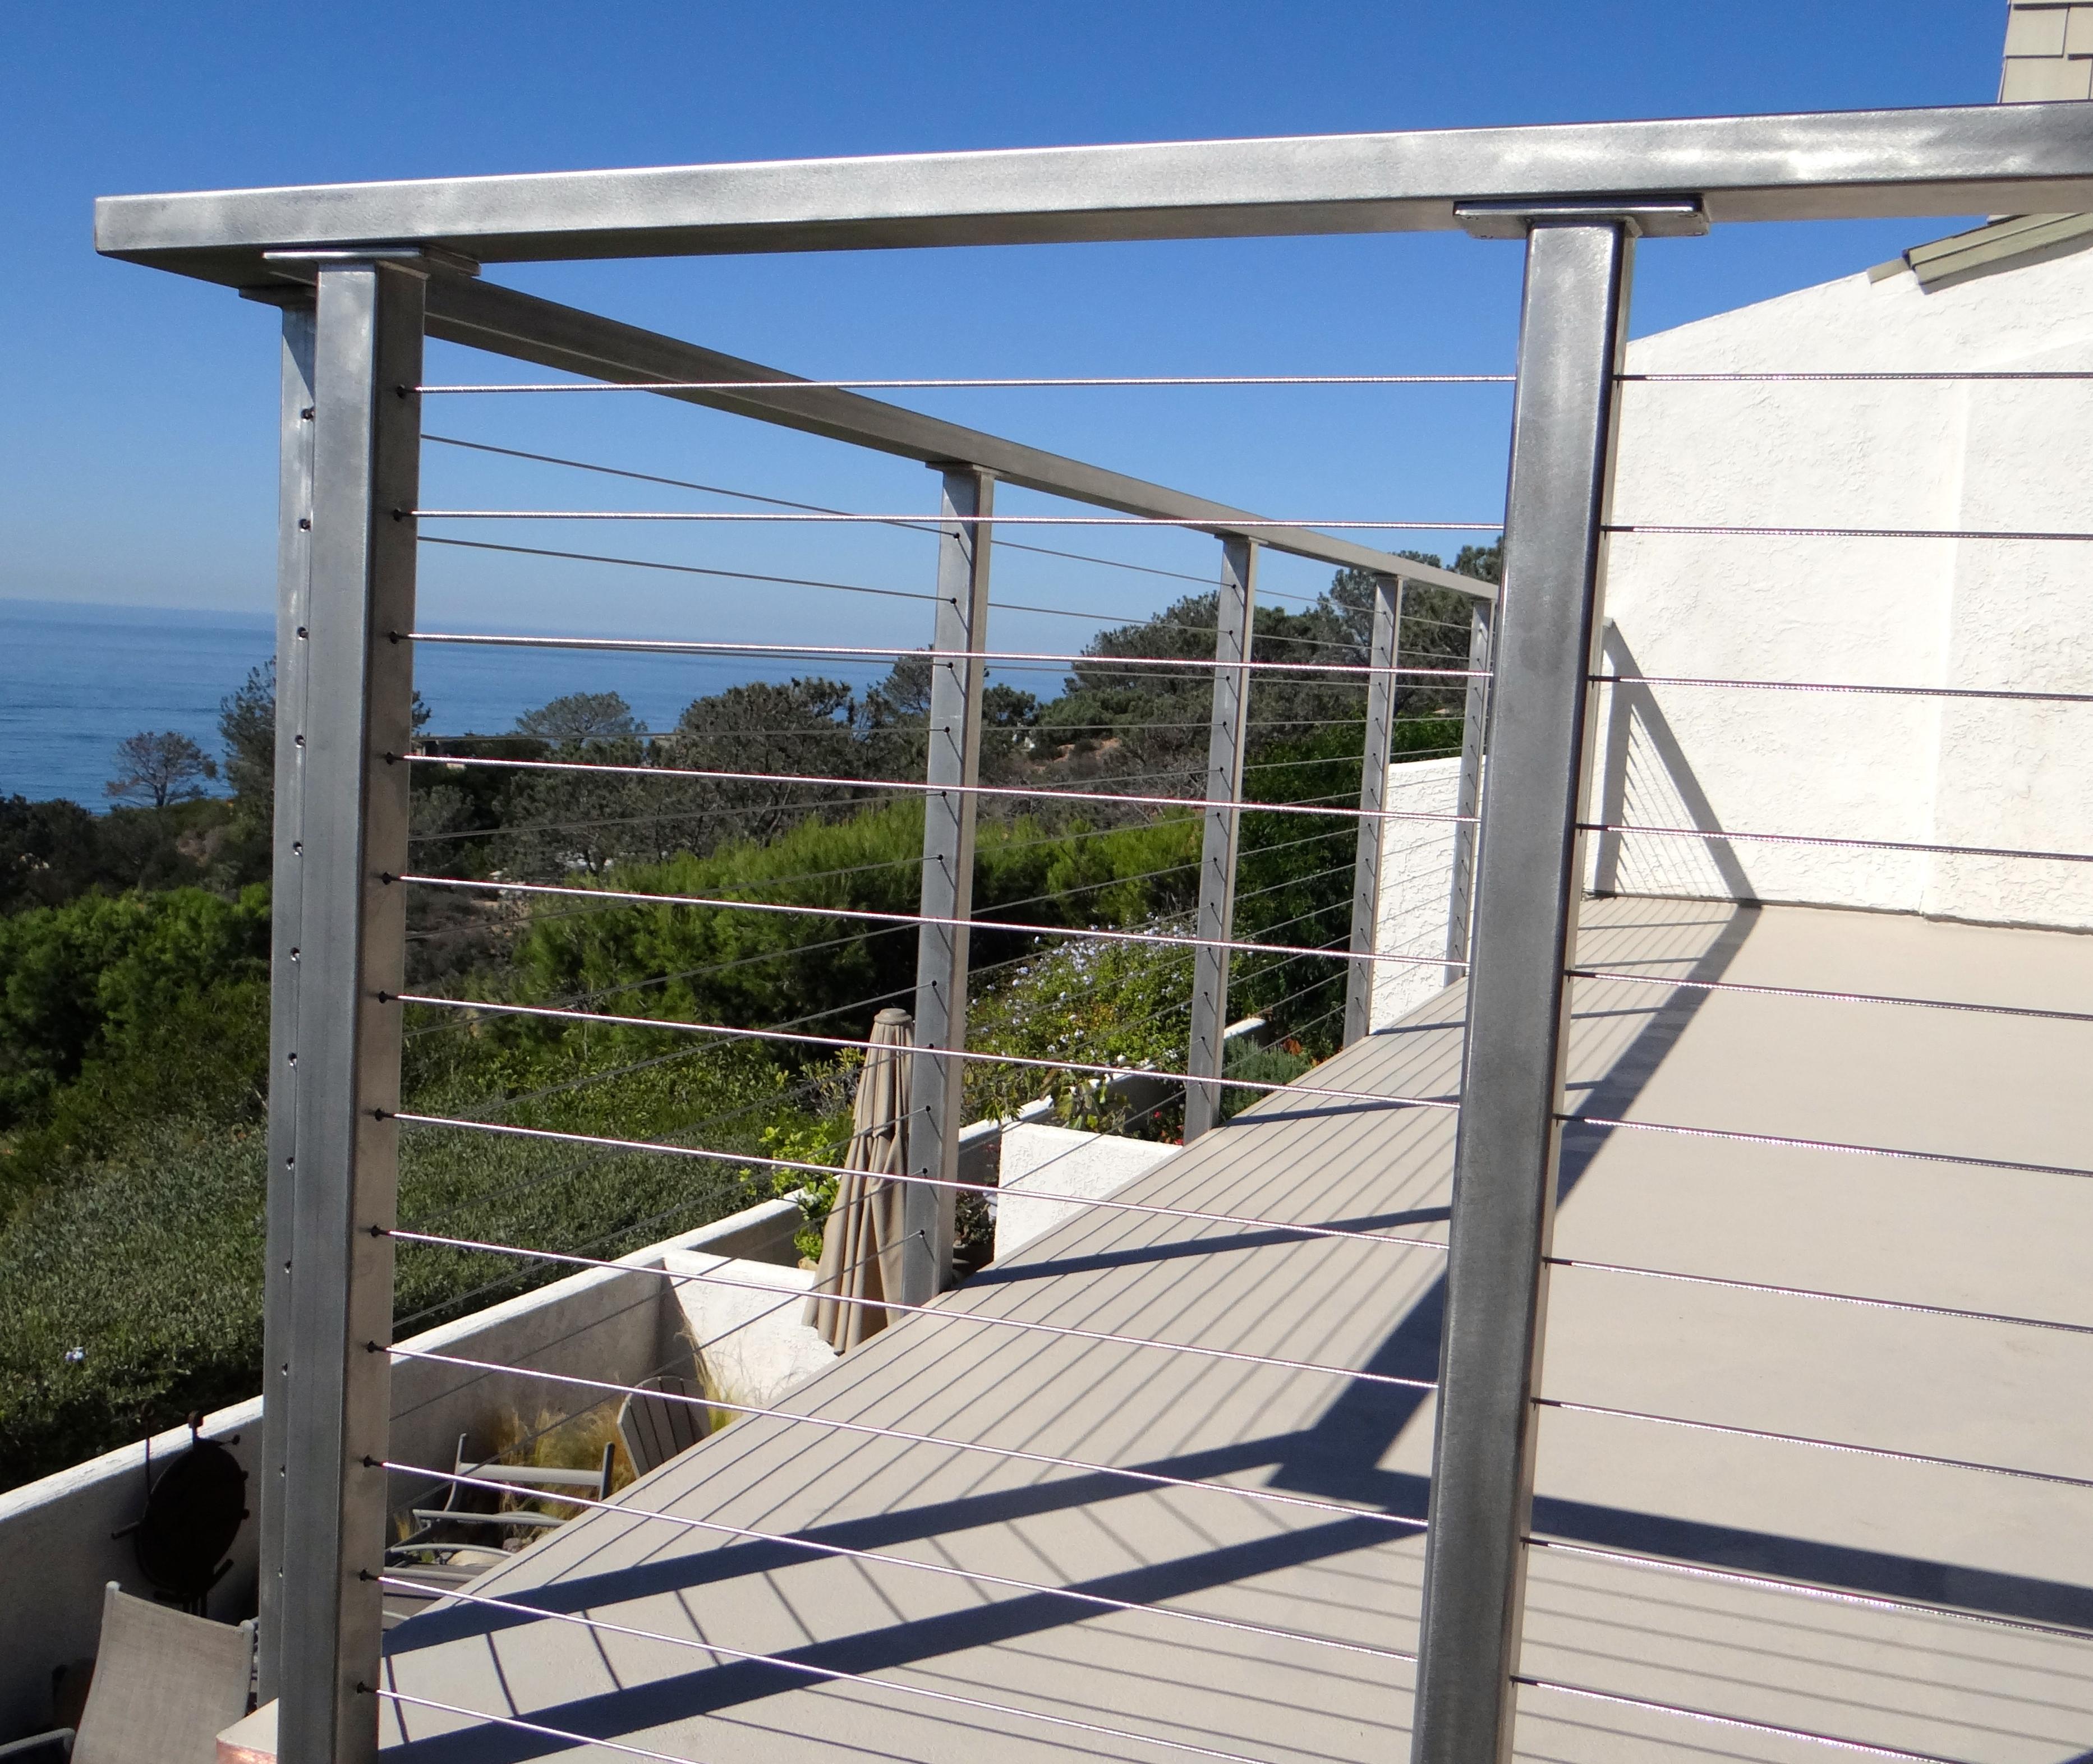 Metal Cable Railings For Decks • Bulbs Ideas